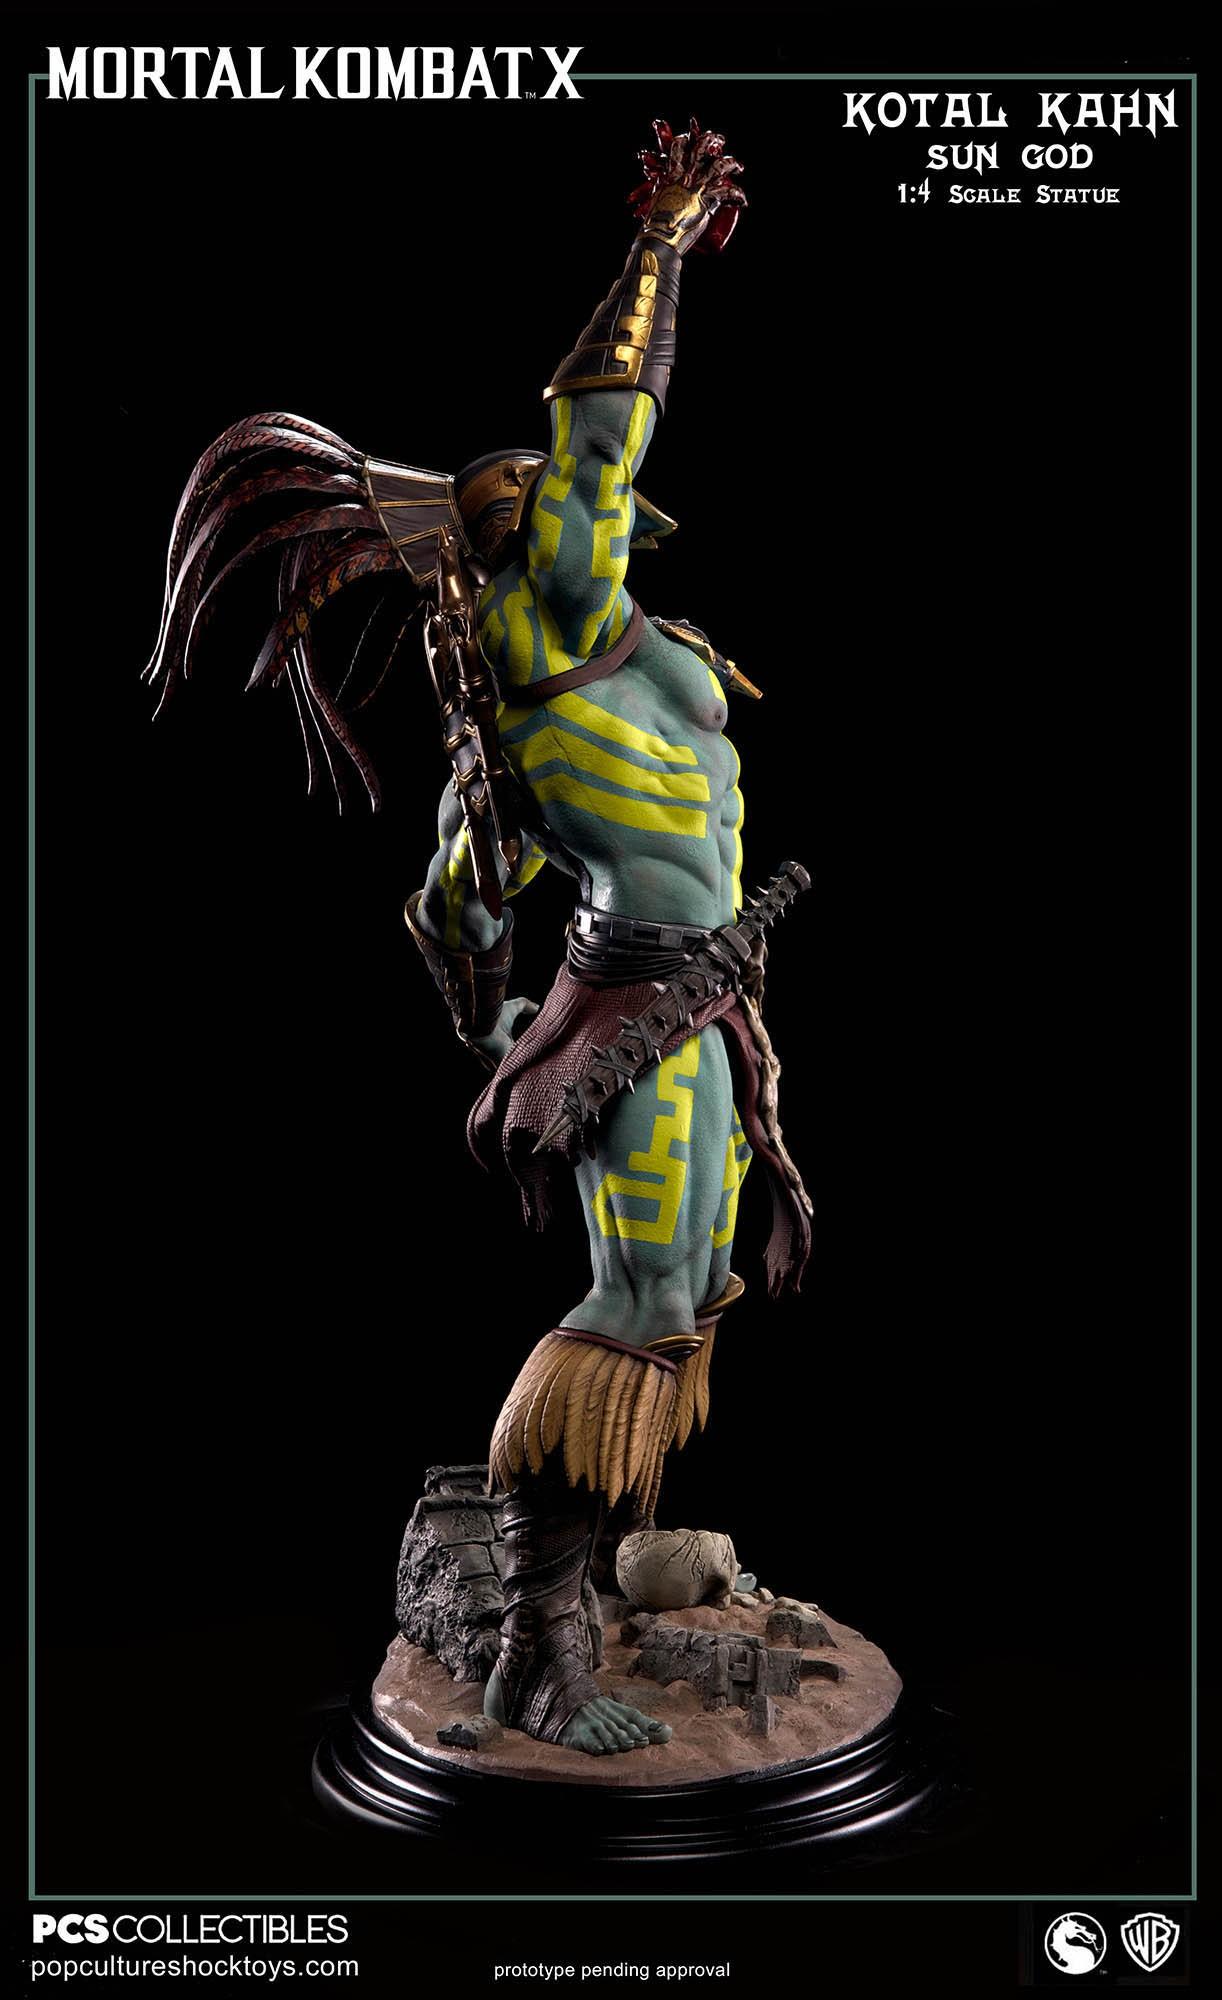 [Pop Culture Shock] Mortal Kombat X: Kotal Kahn 1:4 scale PCS-Kotal-Kahn-Sun-God-011